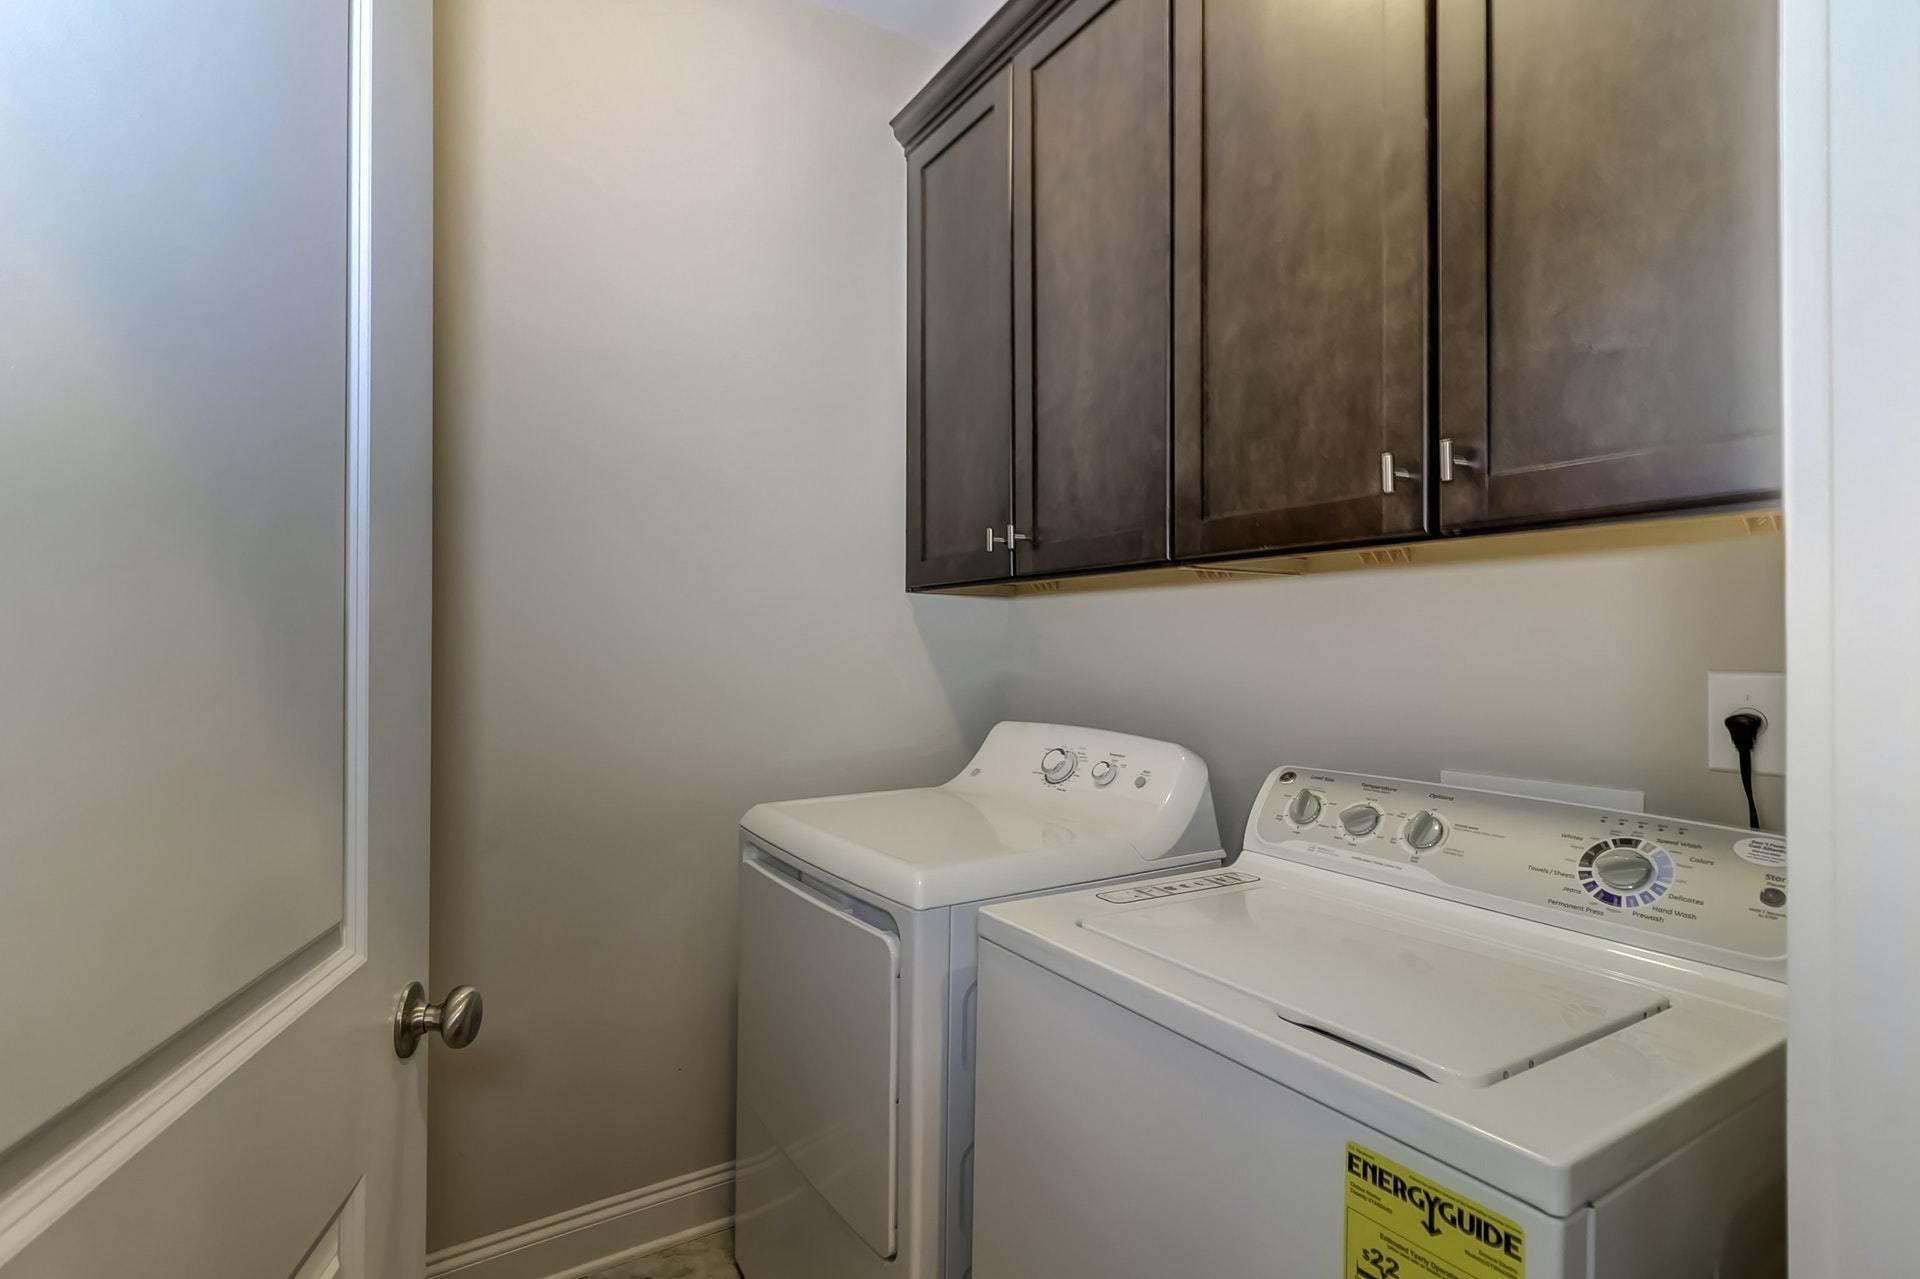 Etiwan Pointe Homes For Sale - 220 Slipper Shell, Mount Pleasant, SC - 11